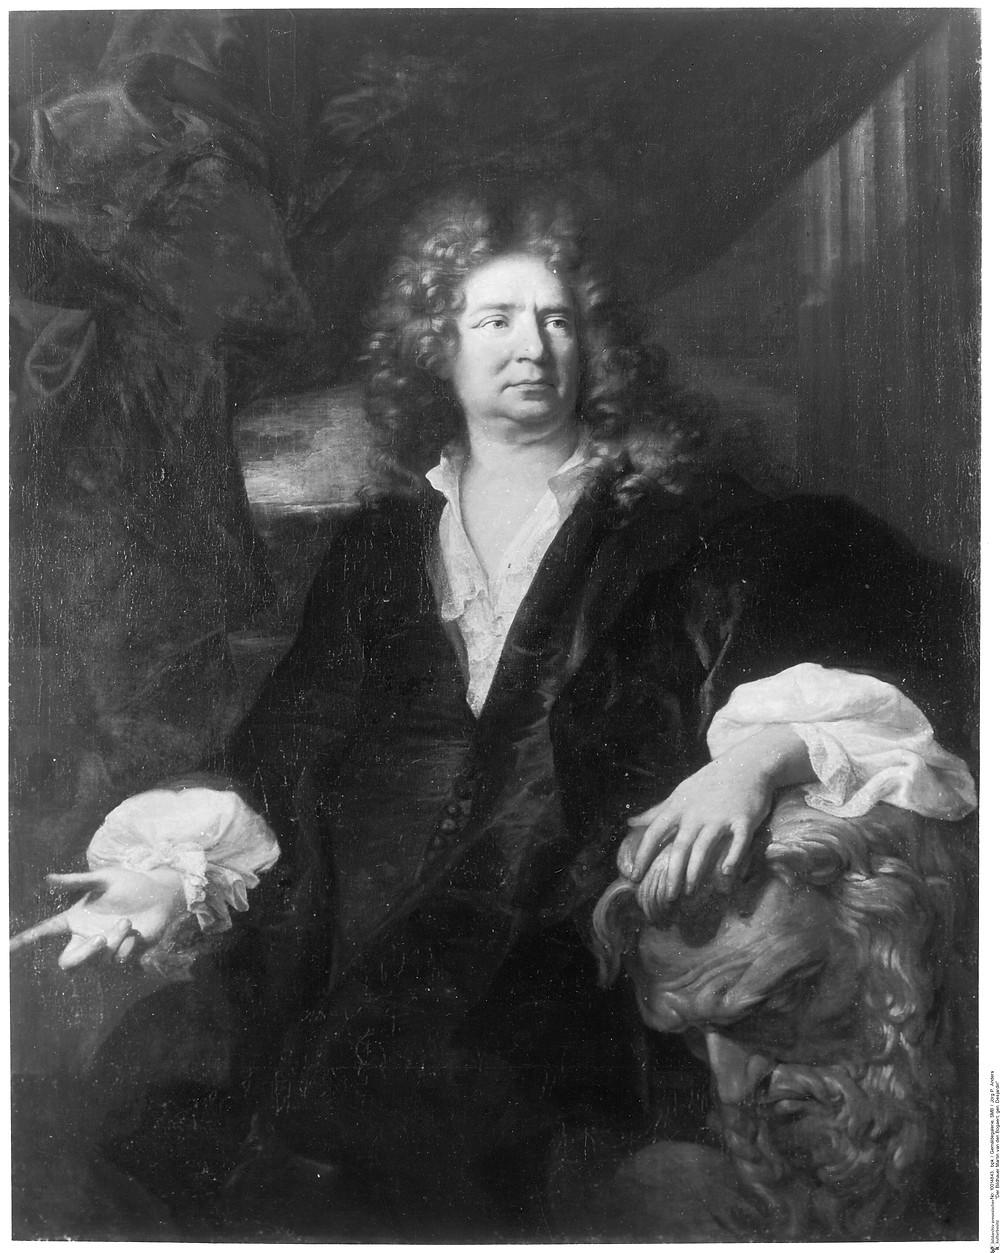 Hyacinthe Rigaud, Portrait du sculpteur Martin van den Bogaert dit Desjardins, 1692, Berlin, Staatliche Museen, Gemäldegalerie, inv. 460